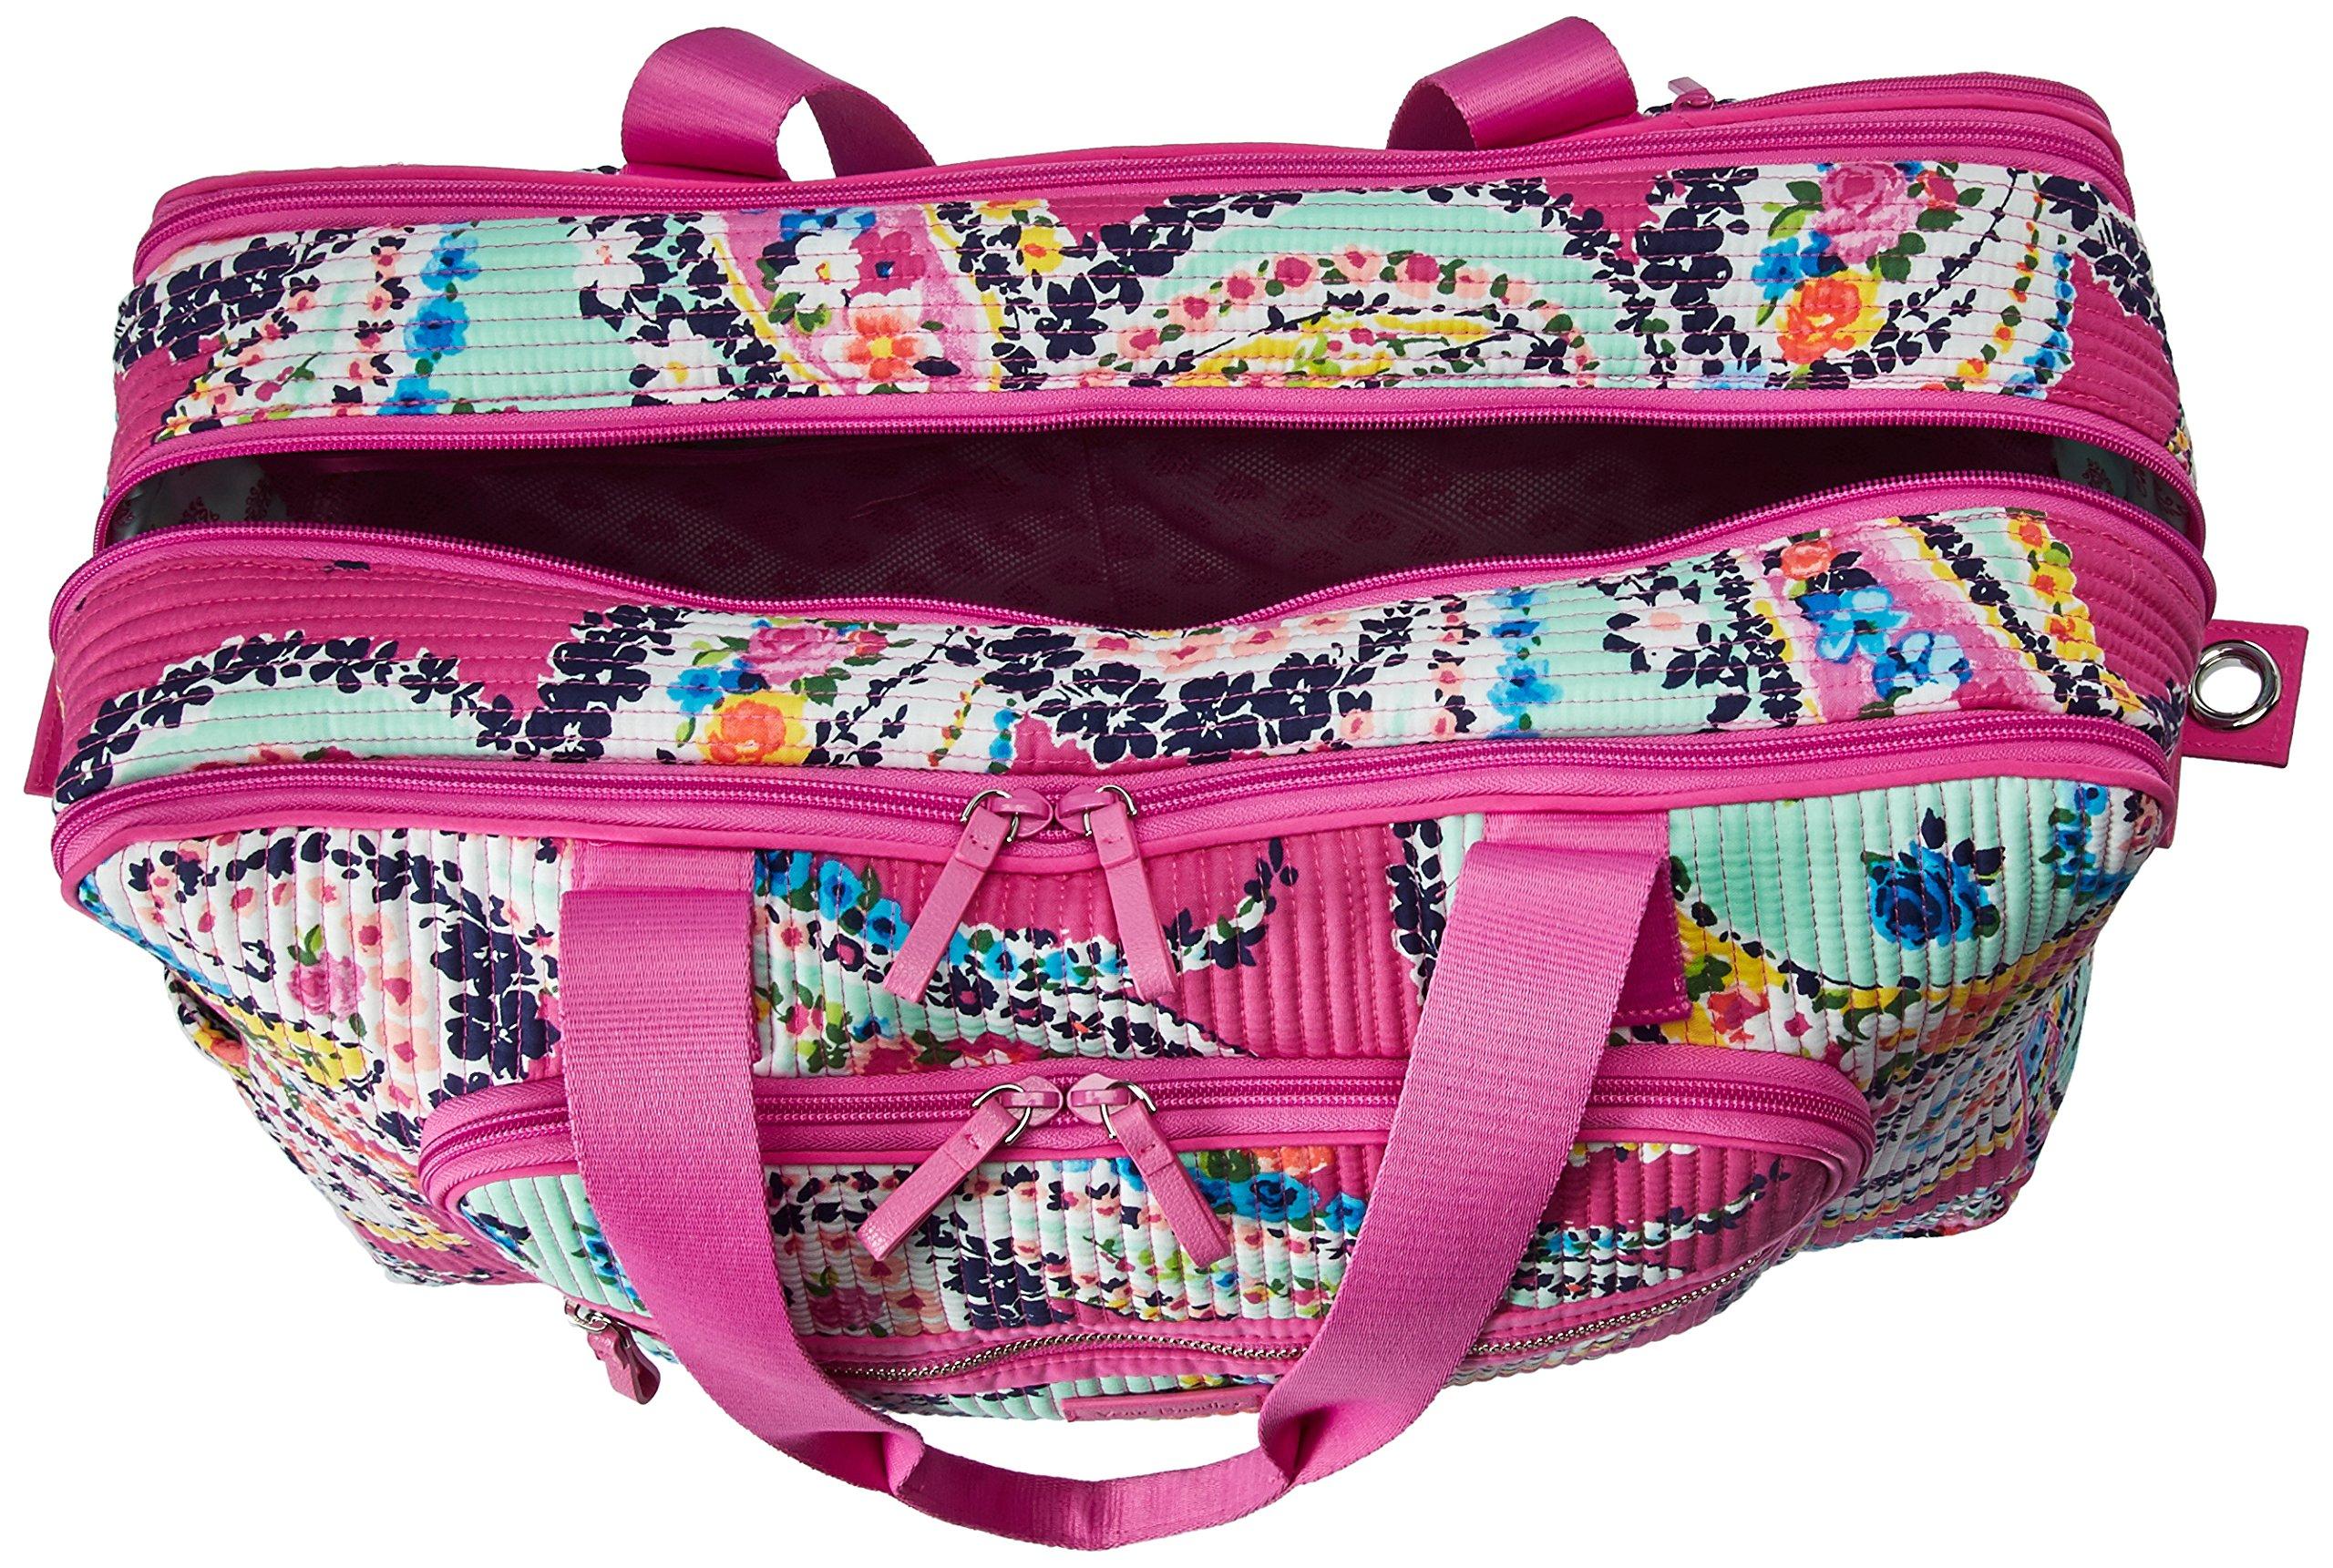 Vera Bradley Iconic Deluxe Weekender Travel Bag, Signature Cotton by Vera Bradley (Image #5)